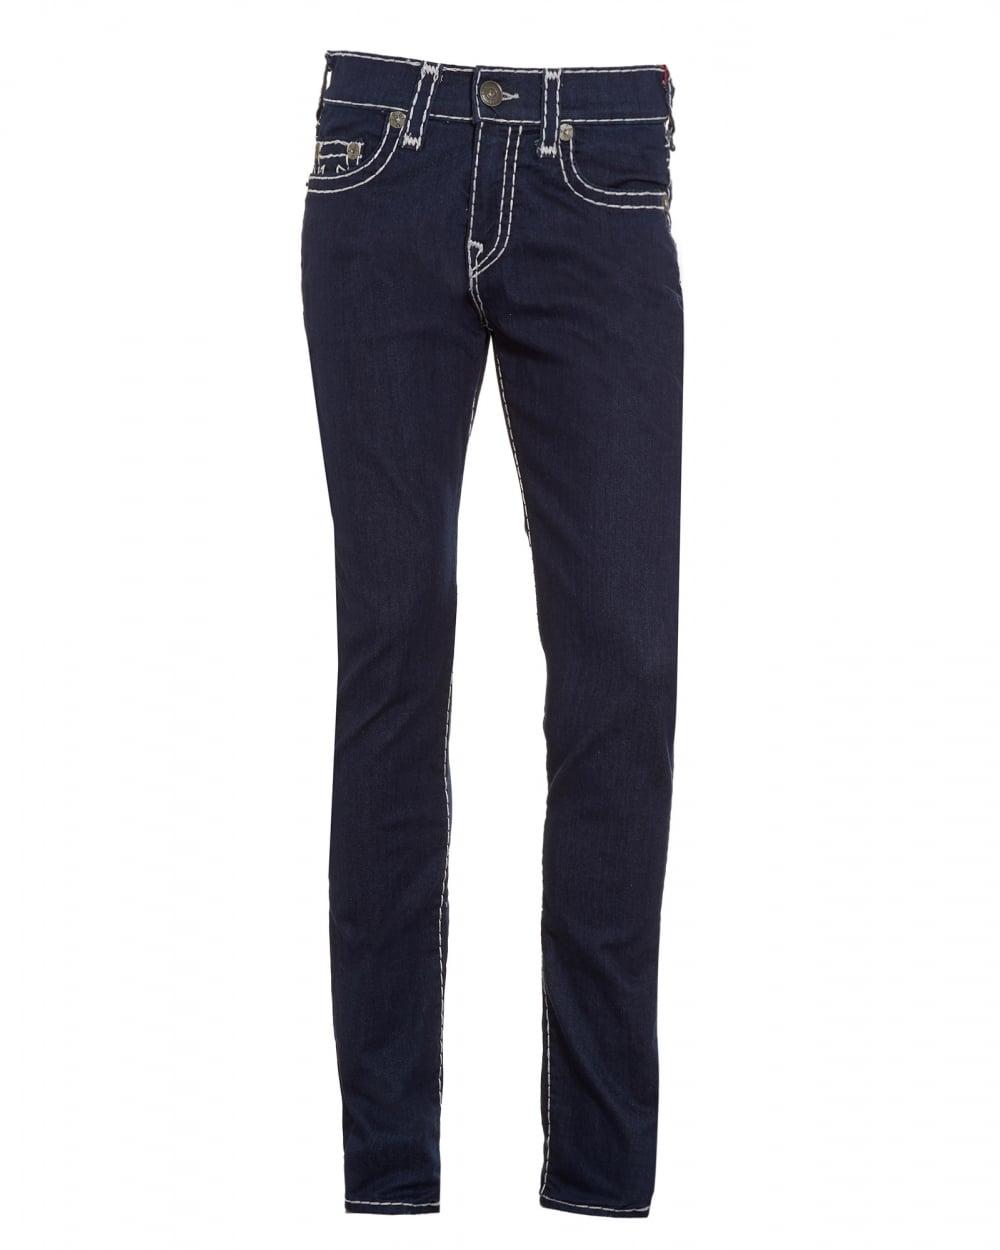 Mens Rocco Super Slim Jeans True Religion N8KTC